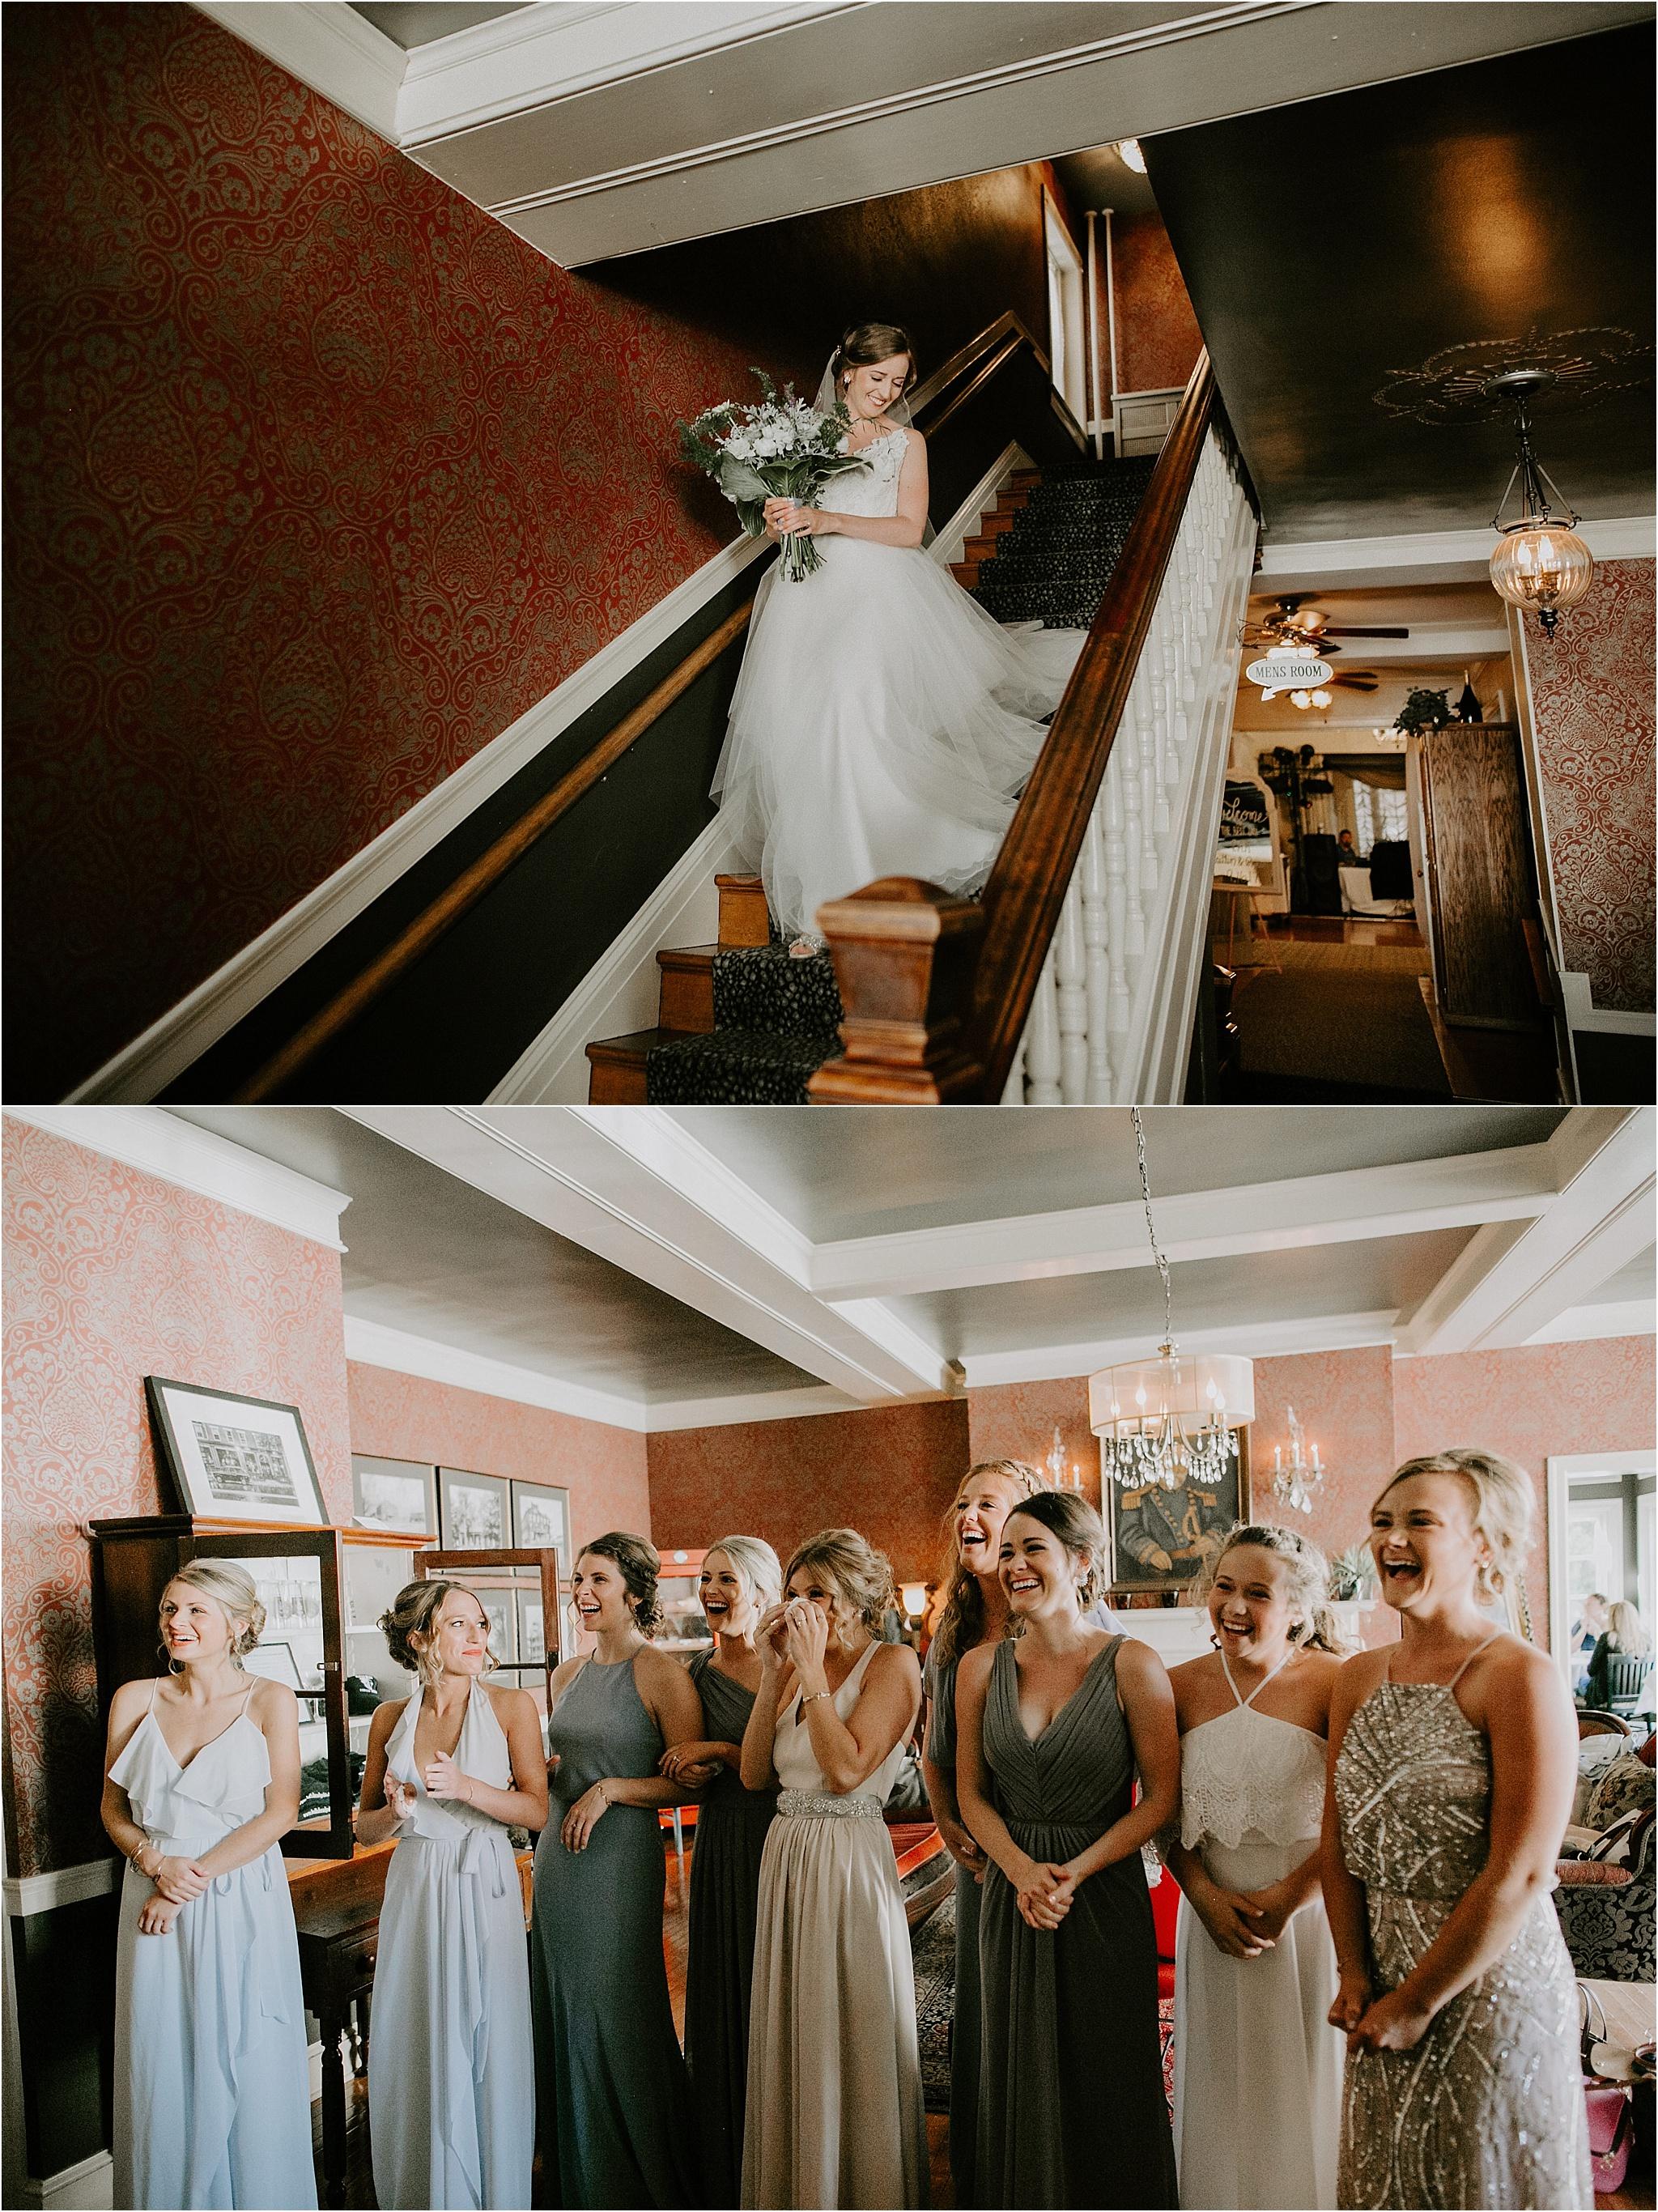 Sarah_Brookhart_Lancaster_Wedding_Photographer_0011.jpg